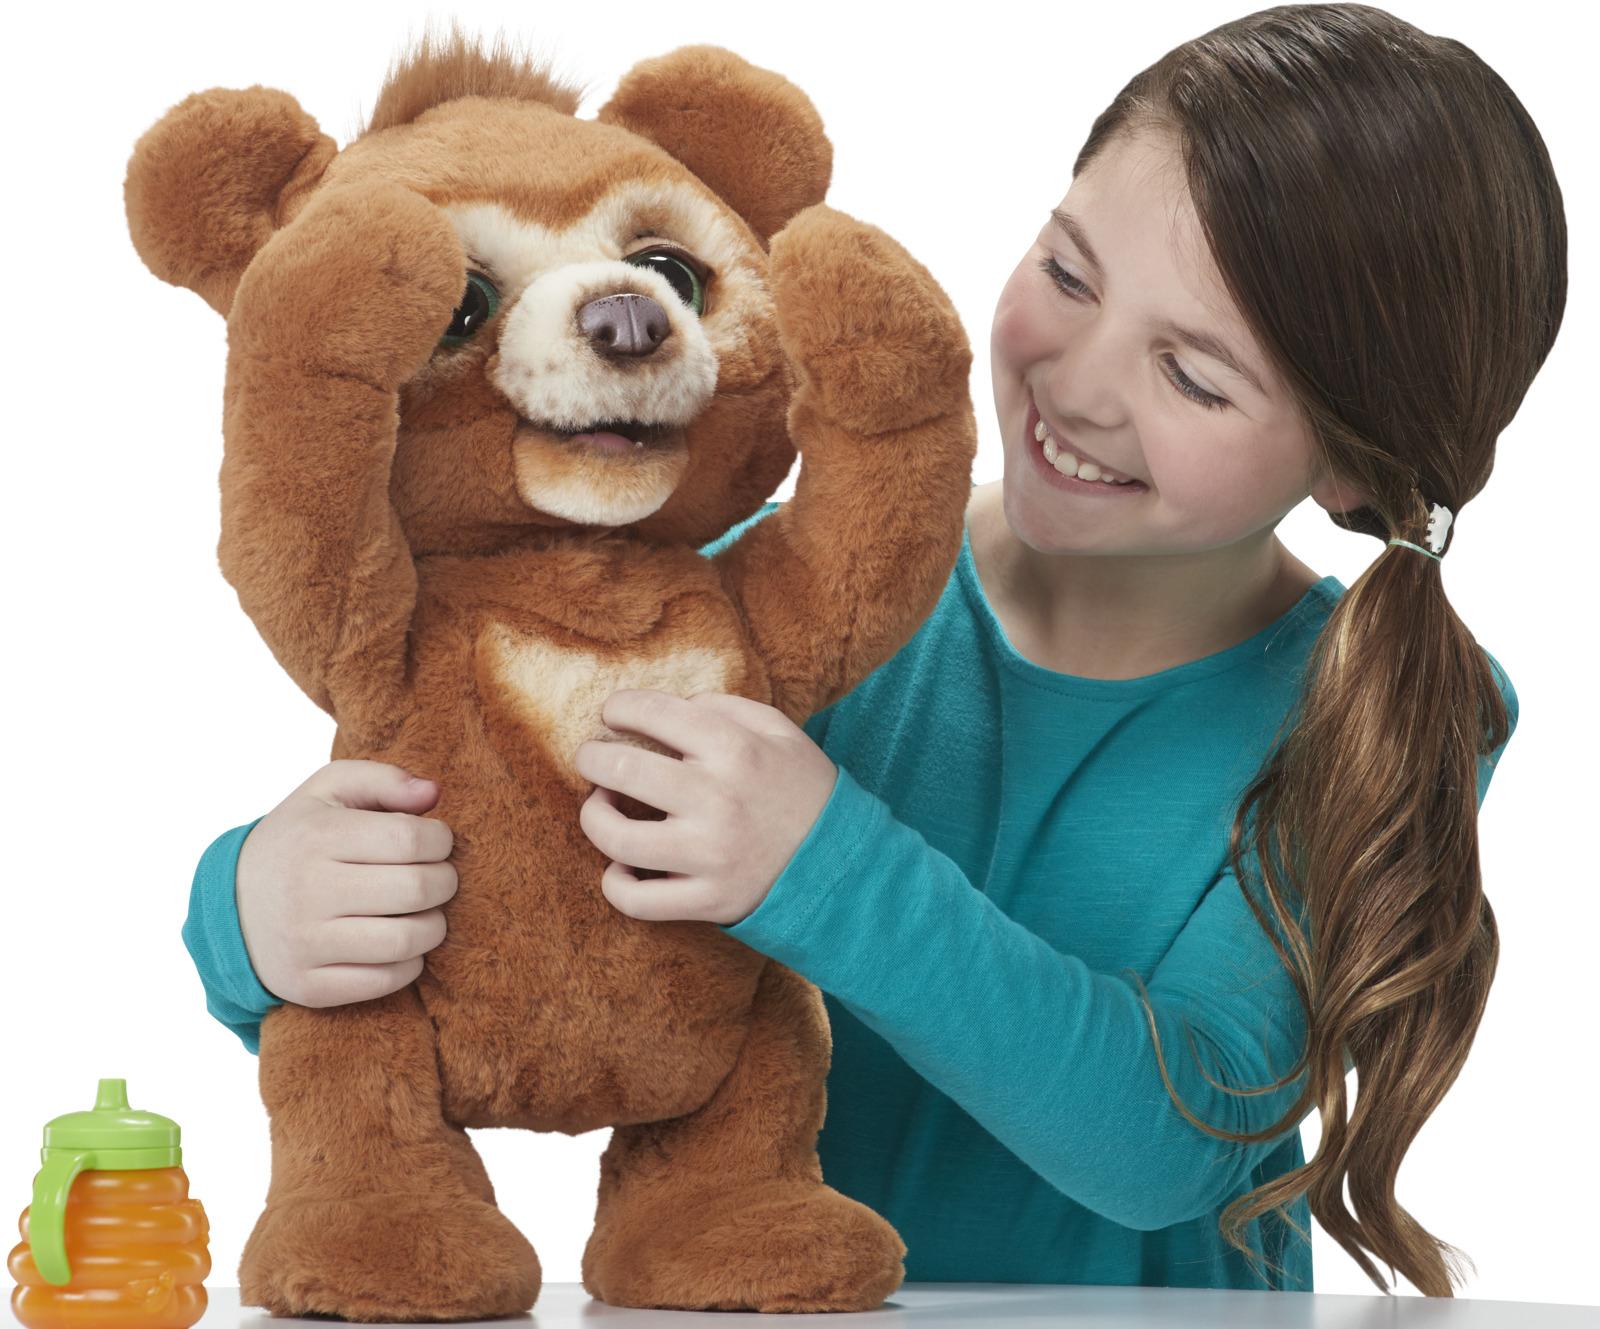 признаках фото игрушек по рекламе устойчивая воде